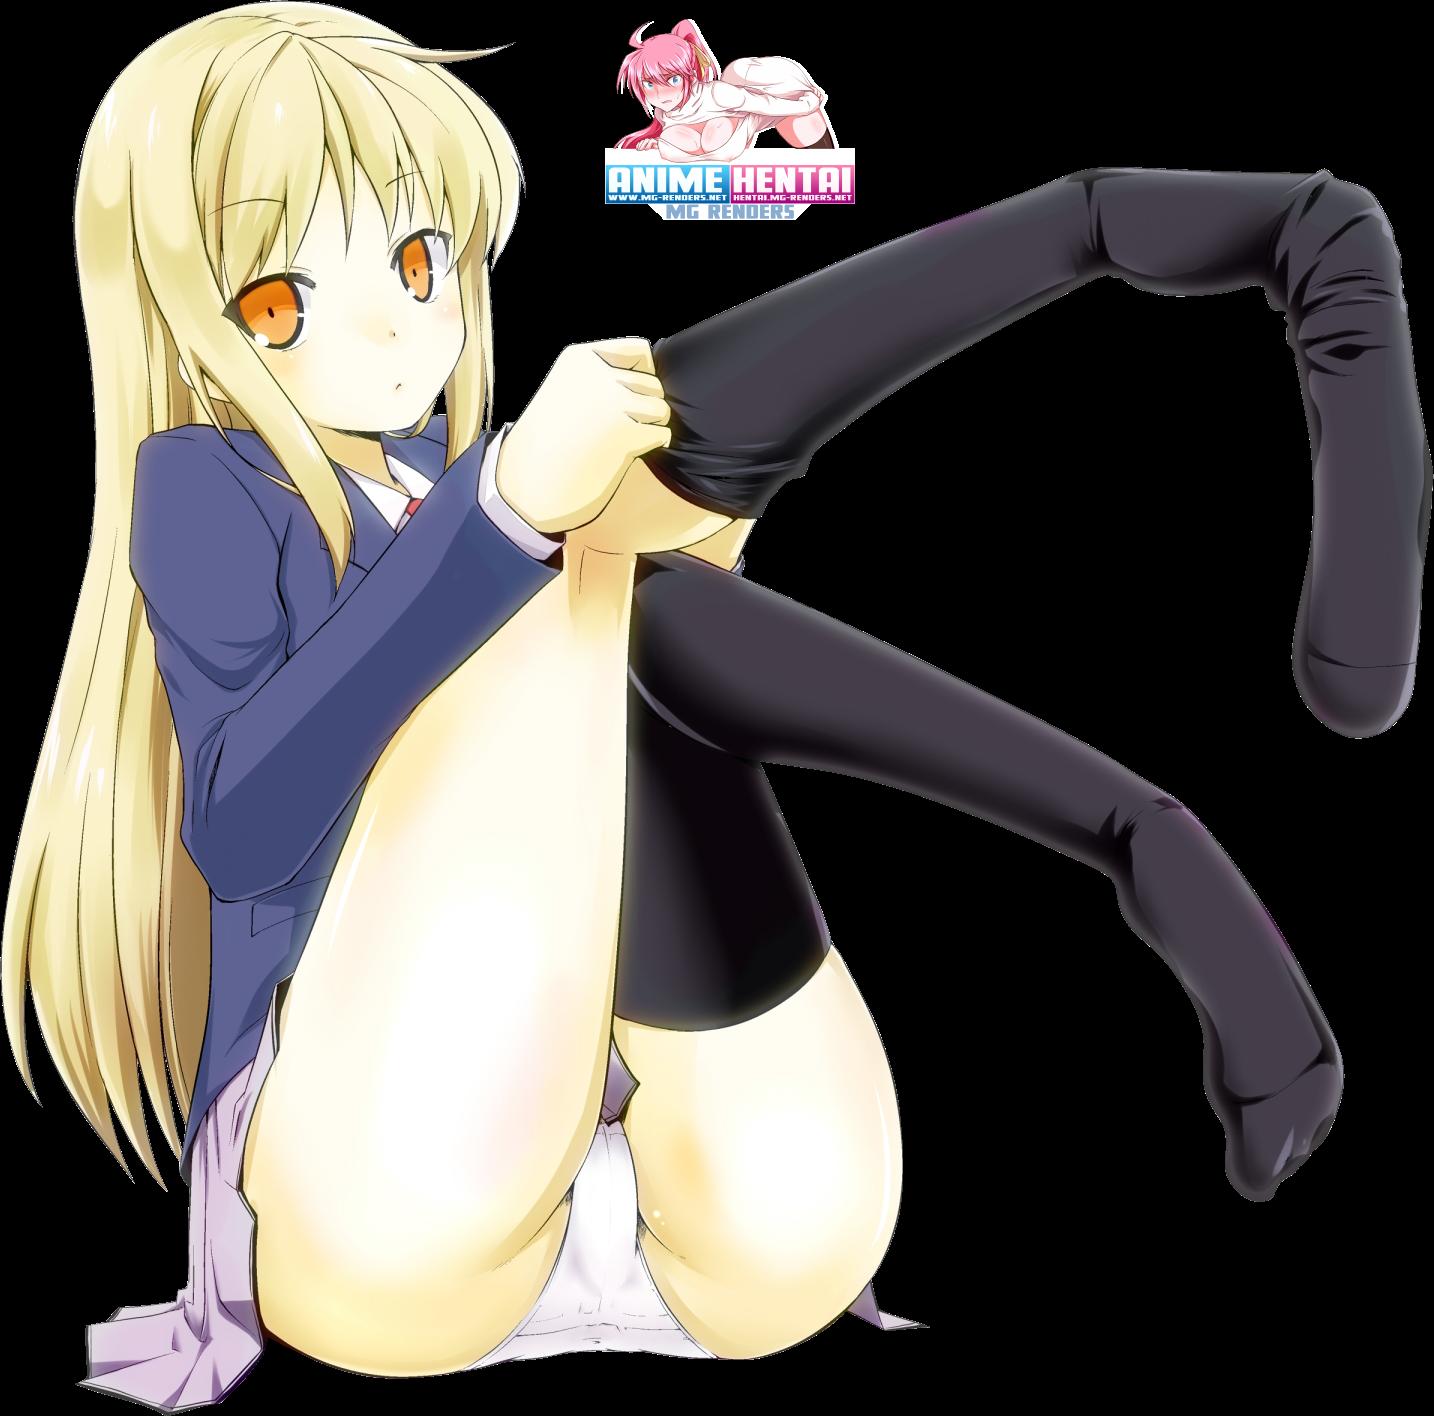 Tags: Anime, Render,  Feet,  Pantsu,  Sakurasou no Pet na Kanojo,  Shiina Mashiro,  Skirt,  Toes,  PNG, Image, Picture